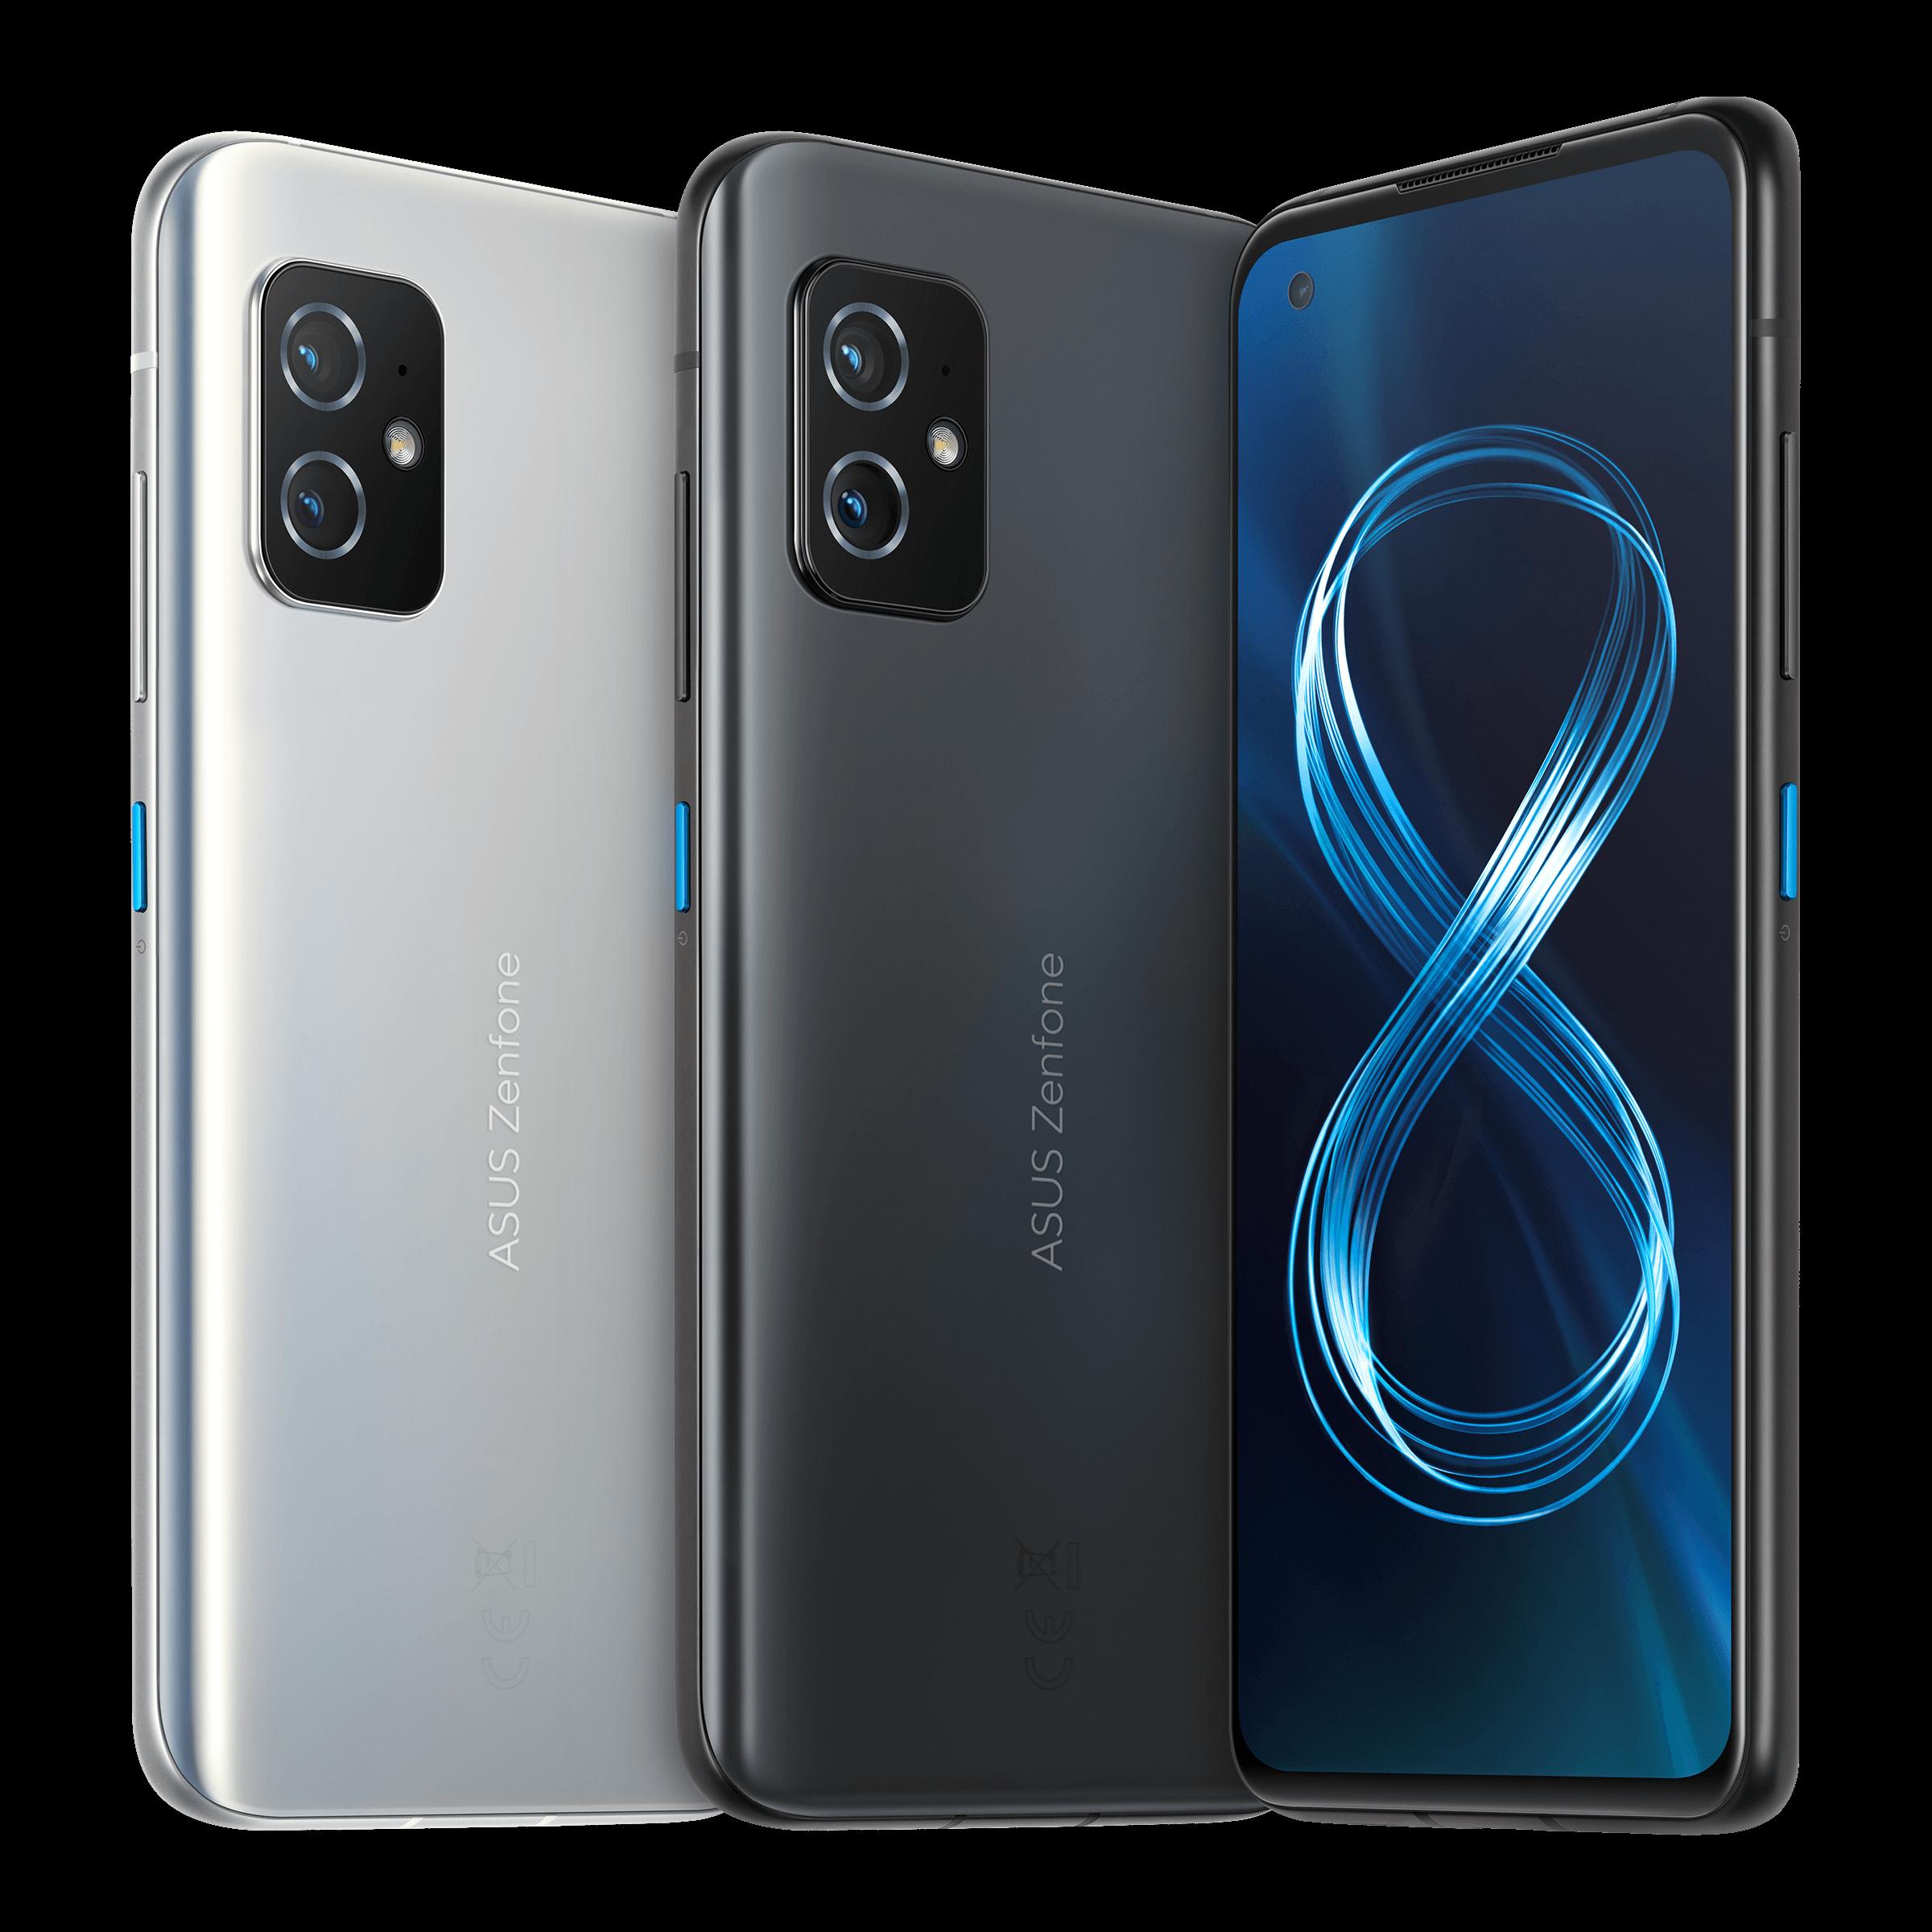 zenfone-8-vs-oneplus-9-vs-vivo-x60-specs-comparison-snapdragon-870-kings